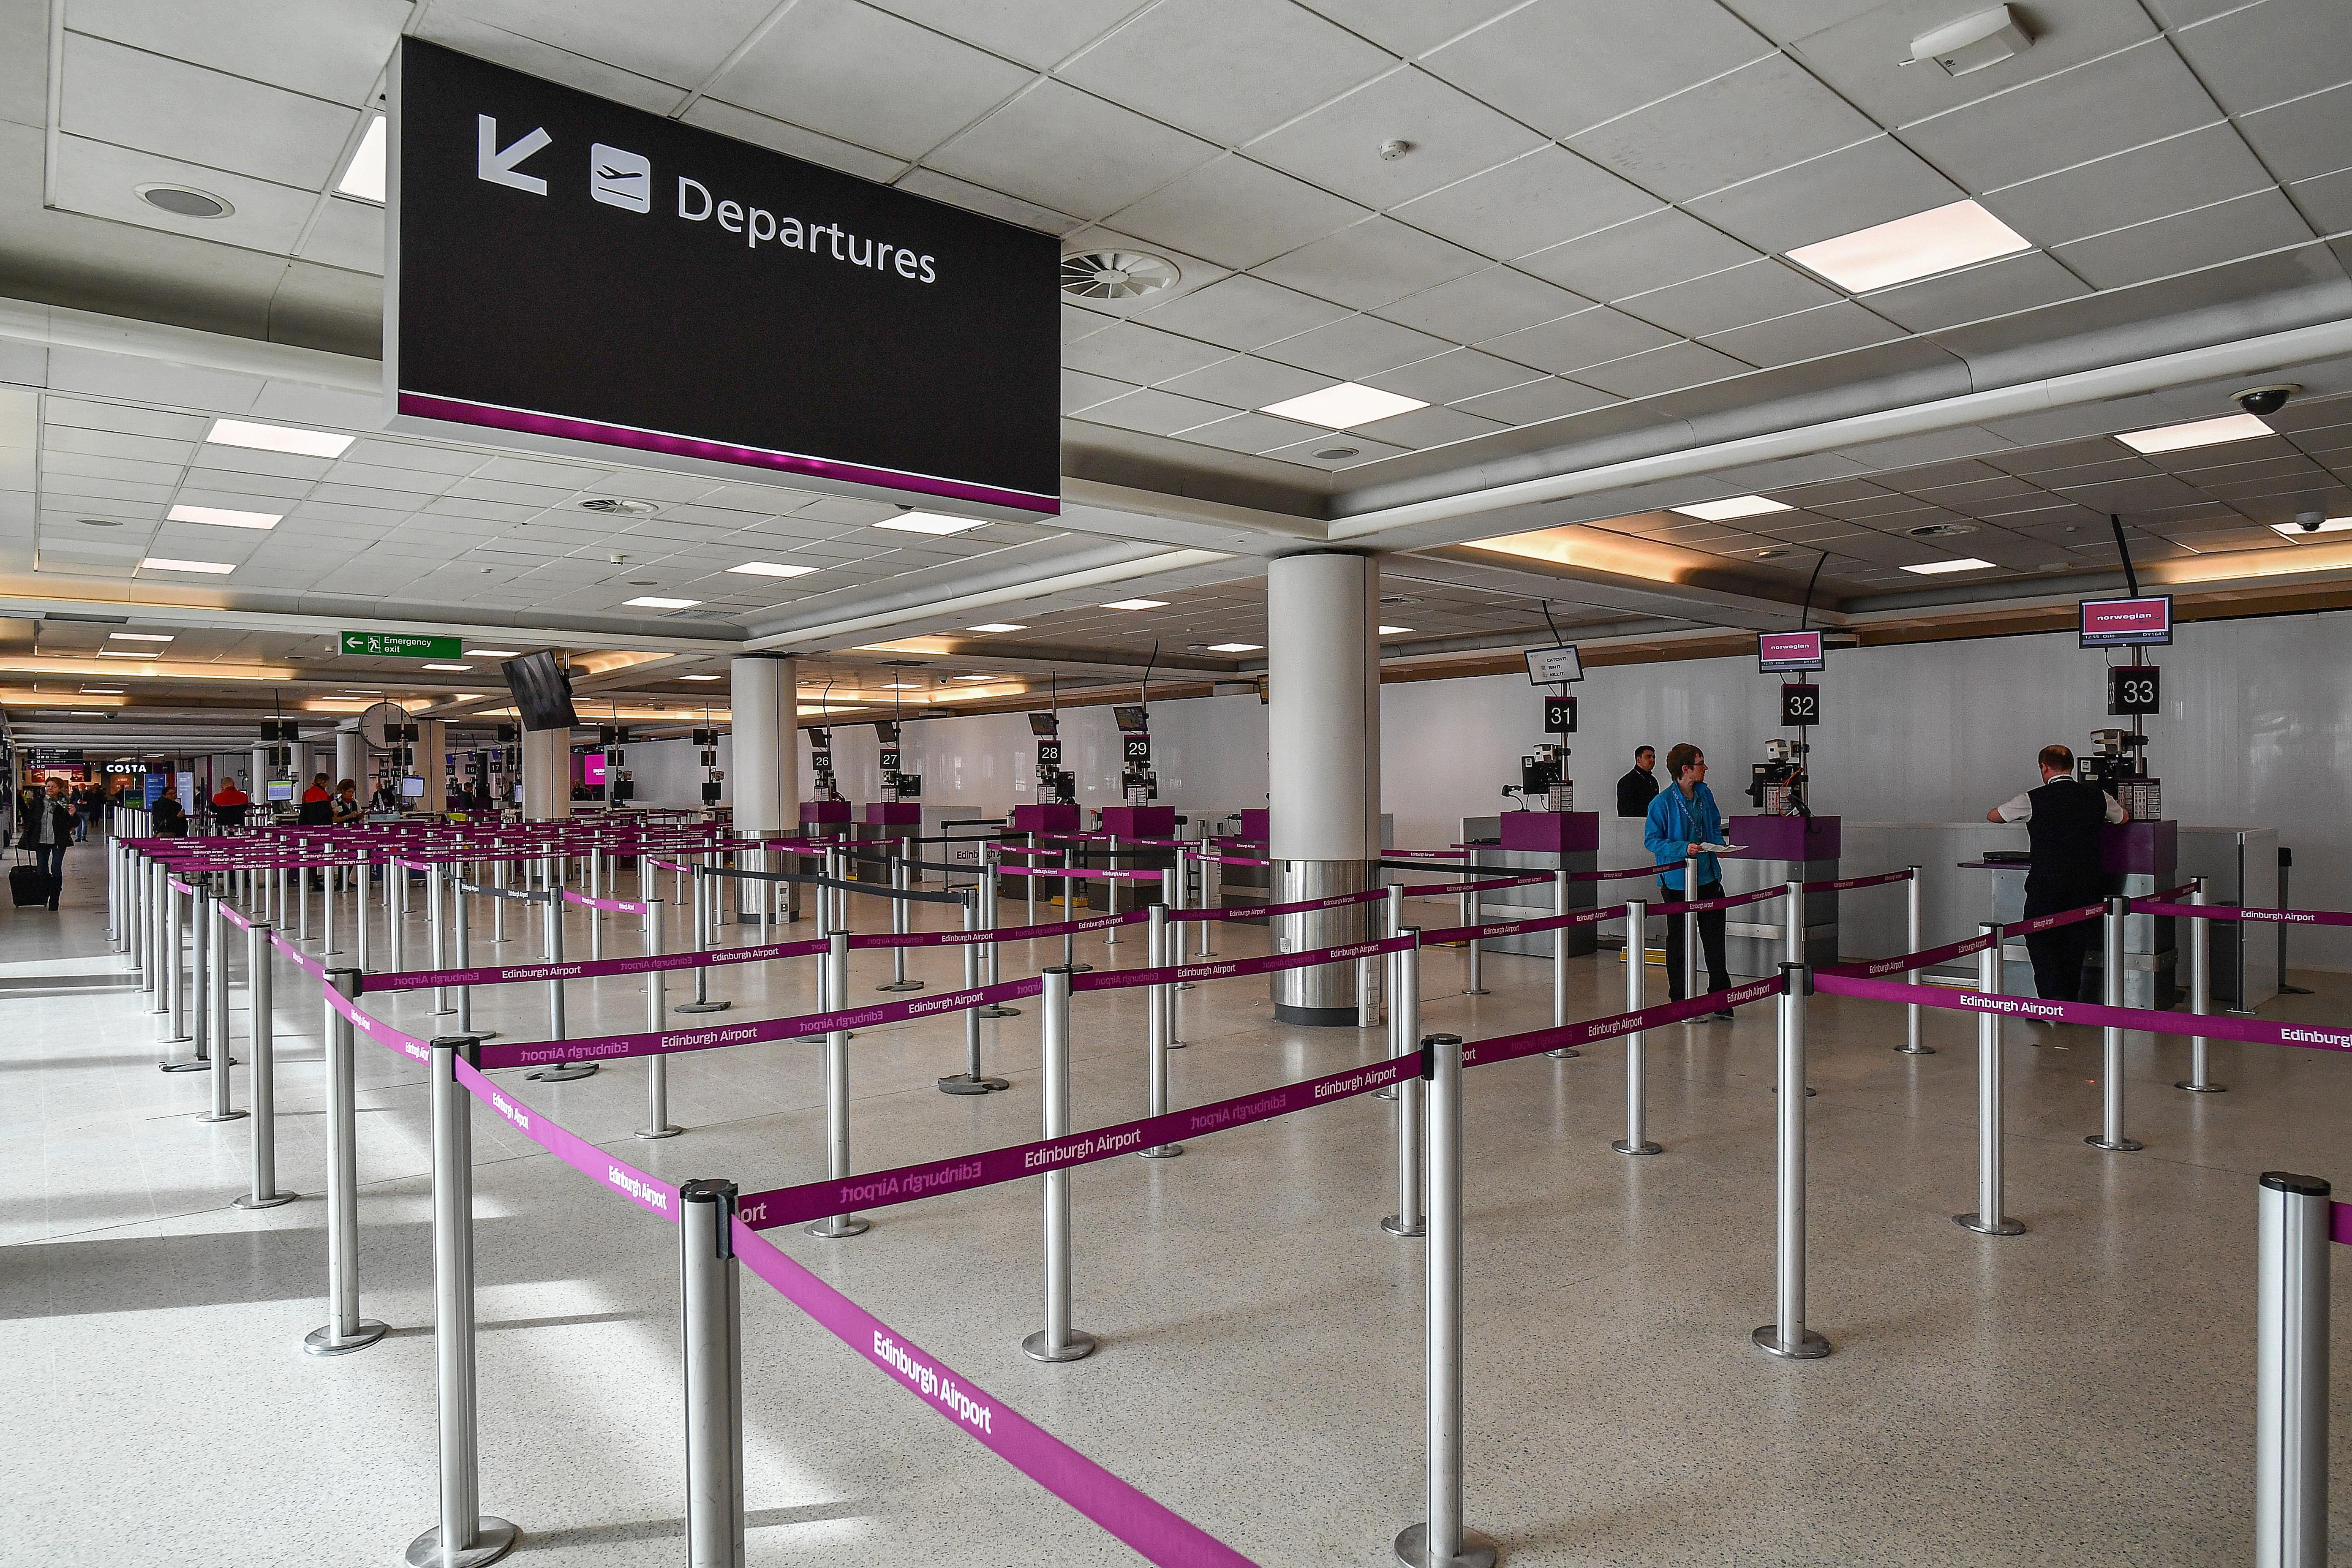 Passengers wait for flights at Edinburgh Airport on March 16, 2020 in Edinburgh,Scotland. (Jeff J Mitchell/Getty Images)